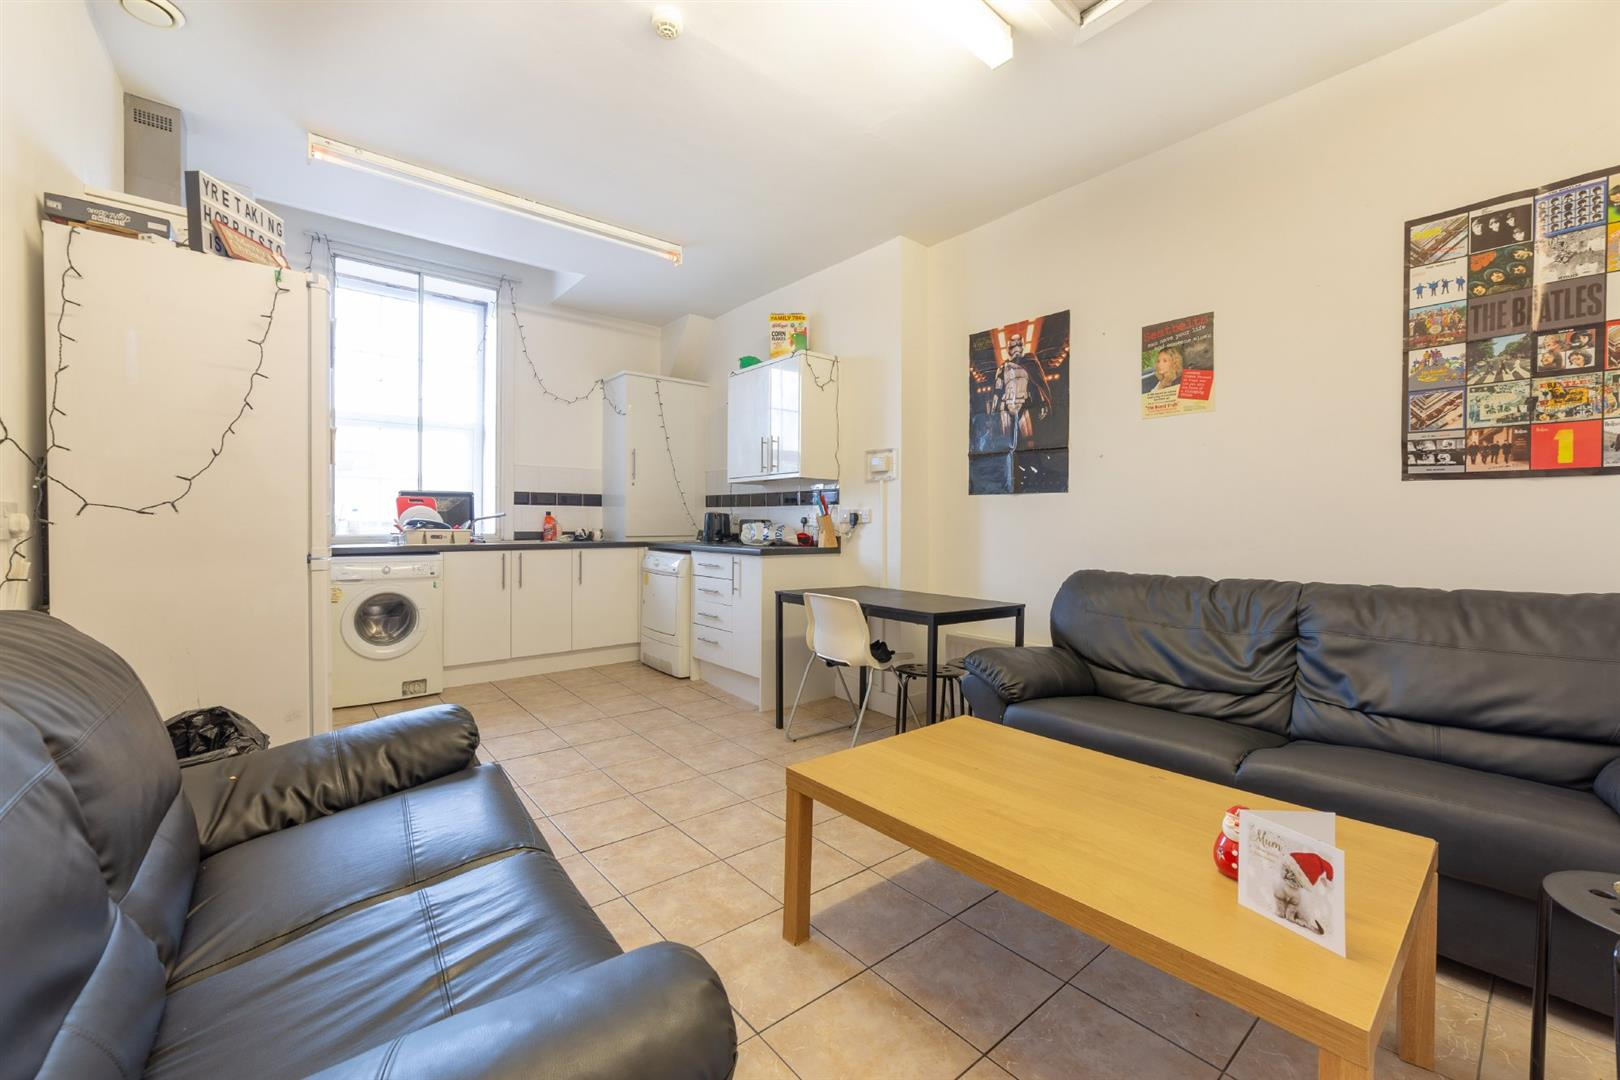 4 bed apartment to rent in Newcastle Upon Tyne, NE1 5DZ, NE1